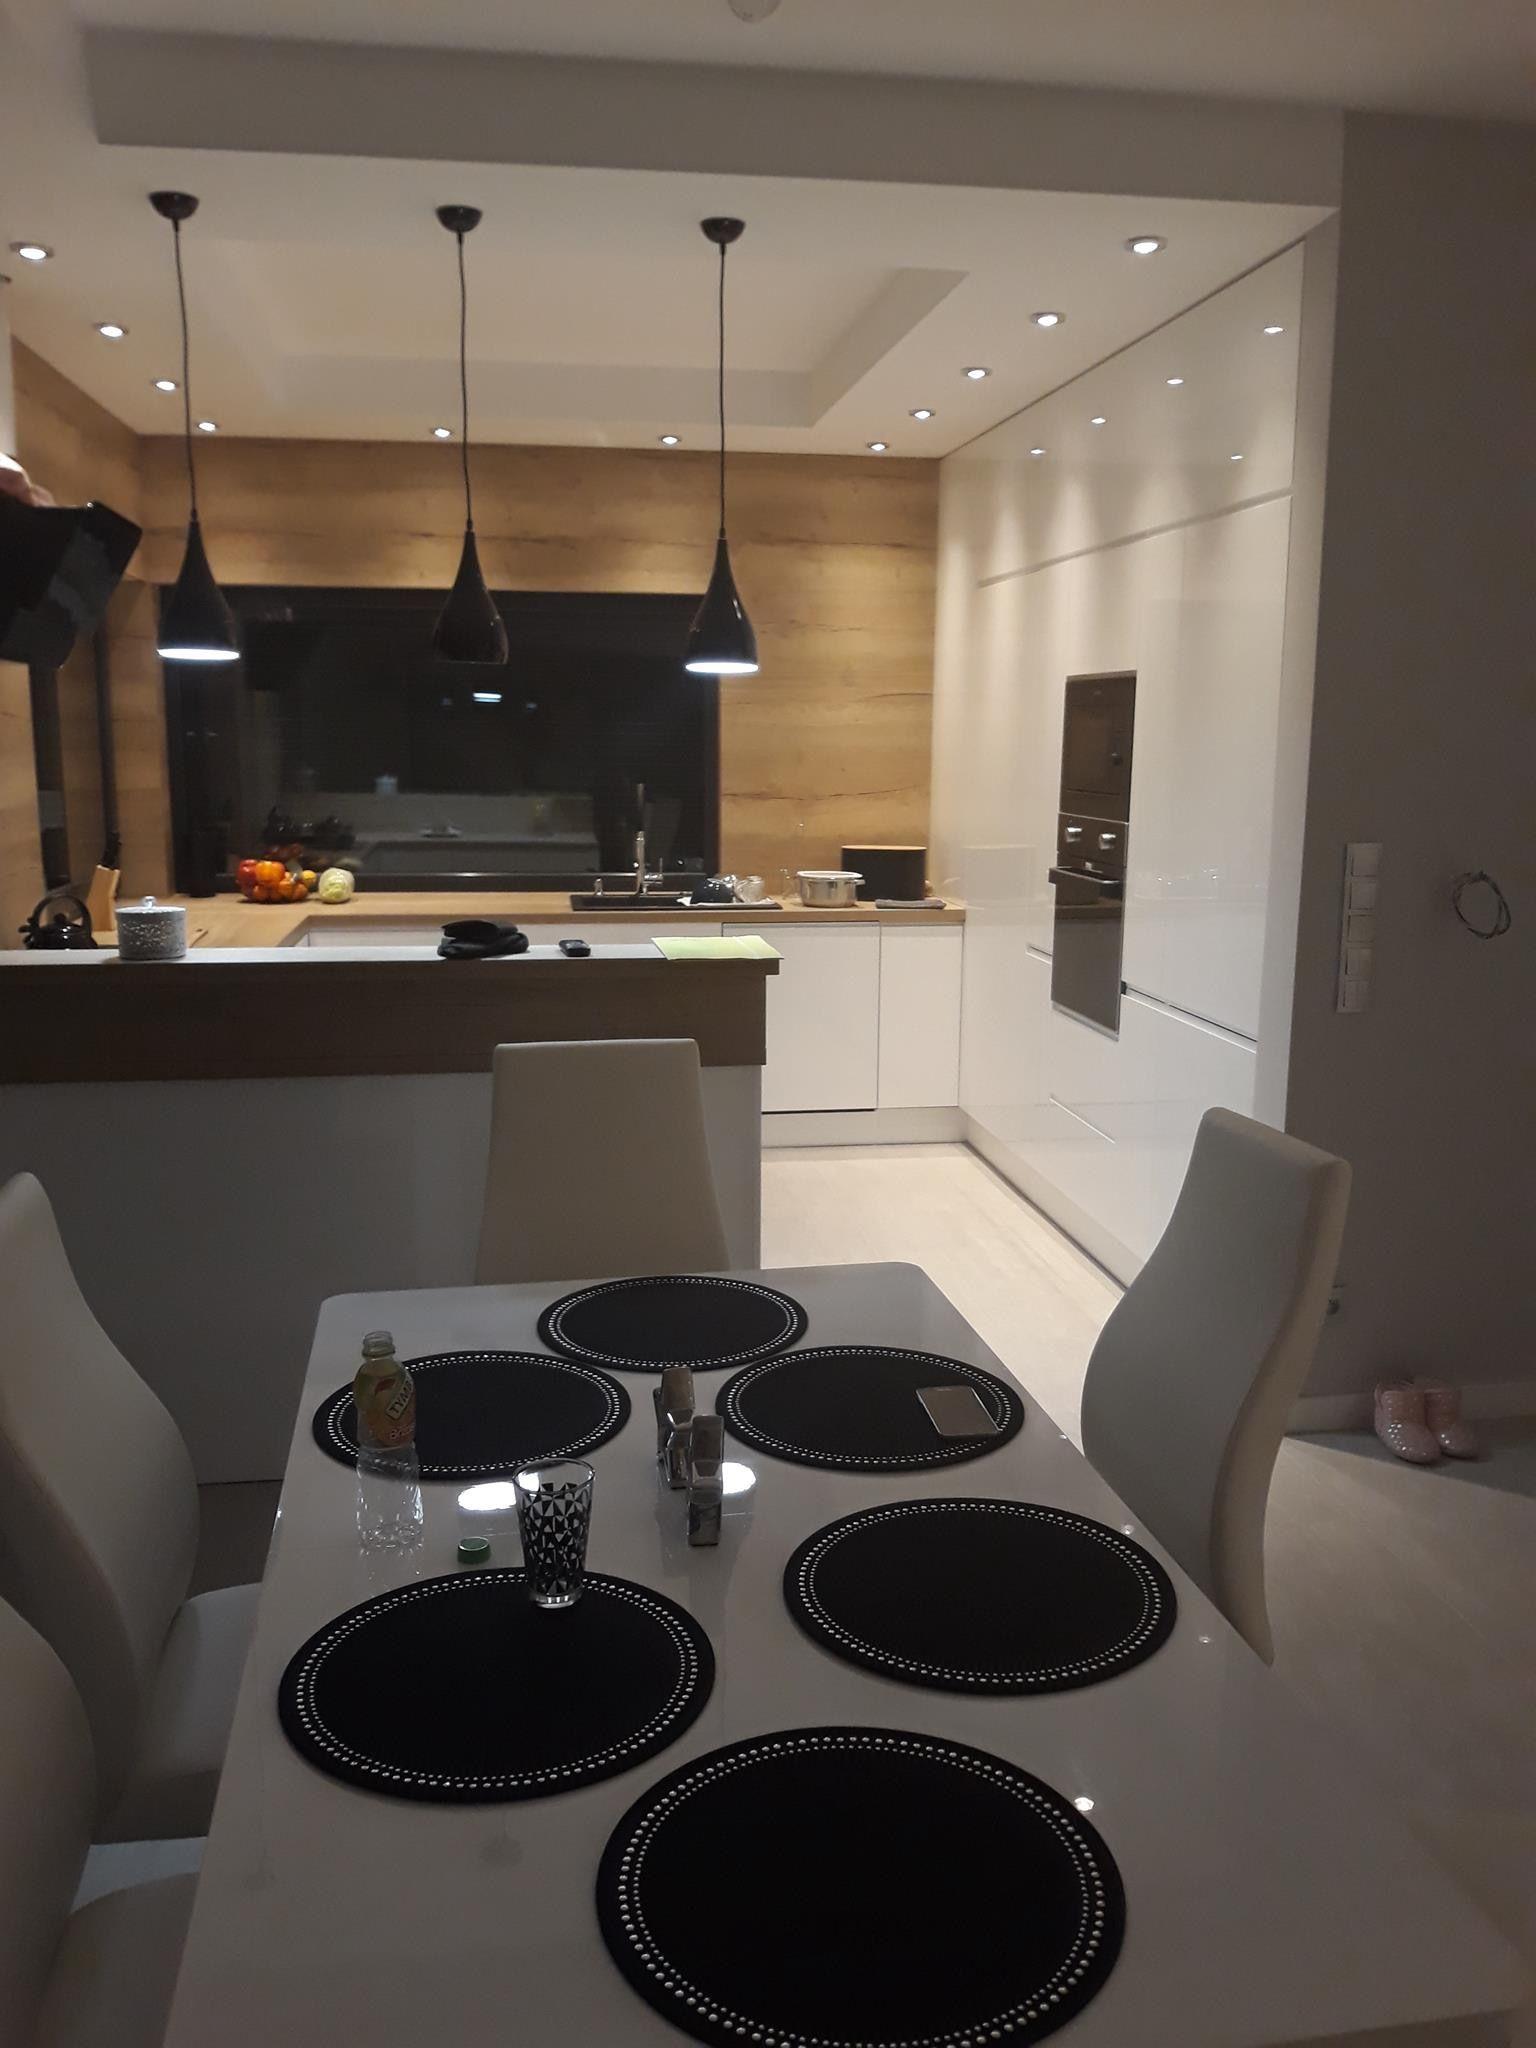 Pin By Janett John On Kuchnie Kitchen Inspiration Design Elegant Kitchen Design Kitchen Layout Plans